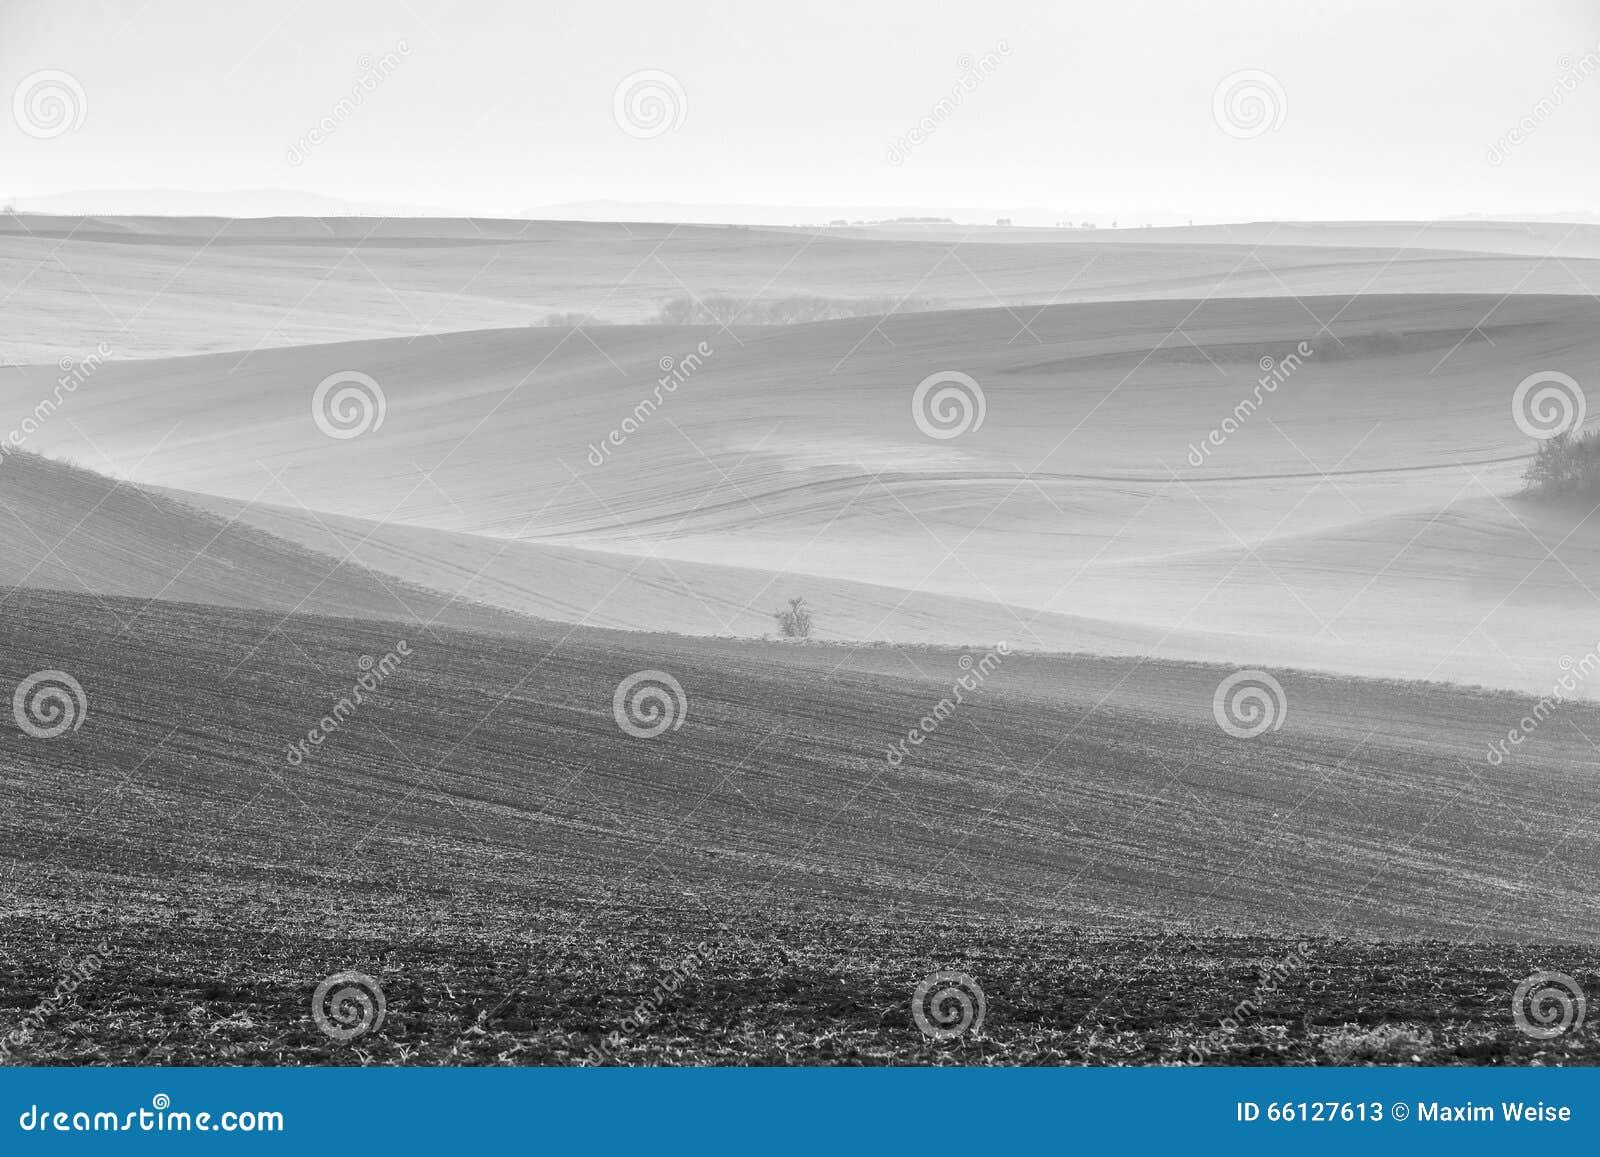 Wiosna fartuch Moravia pola w chmurnym dniu